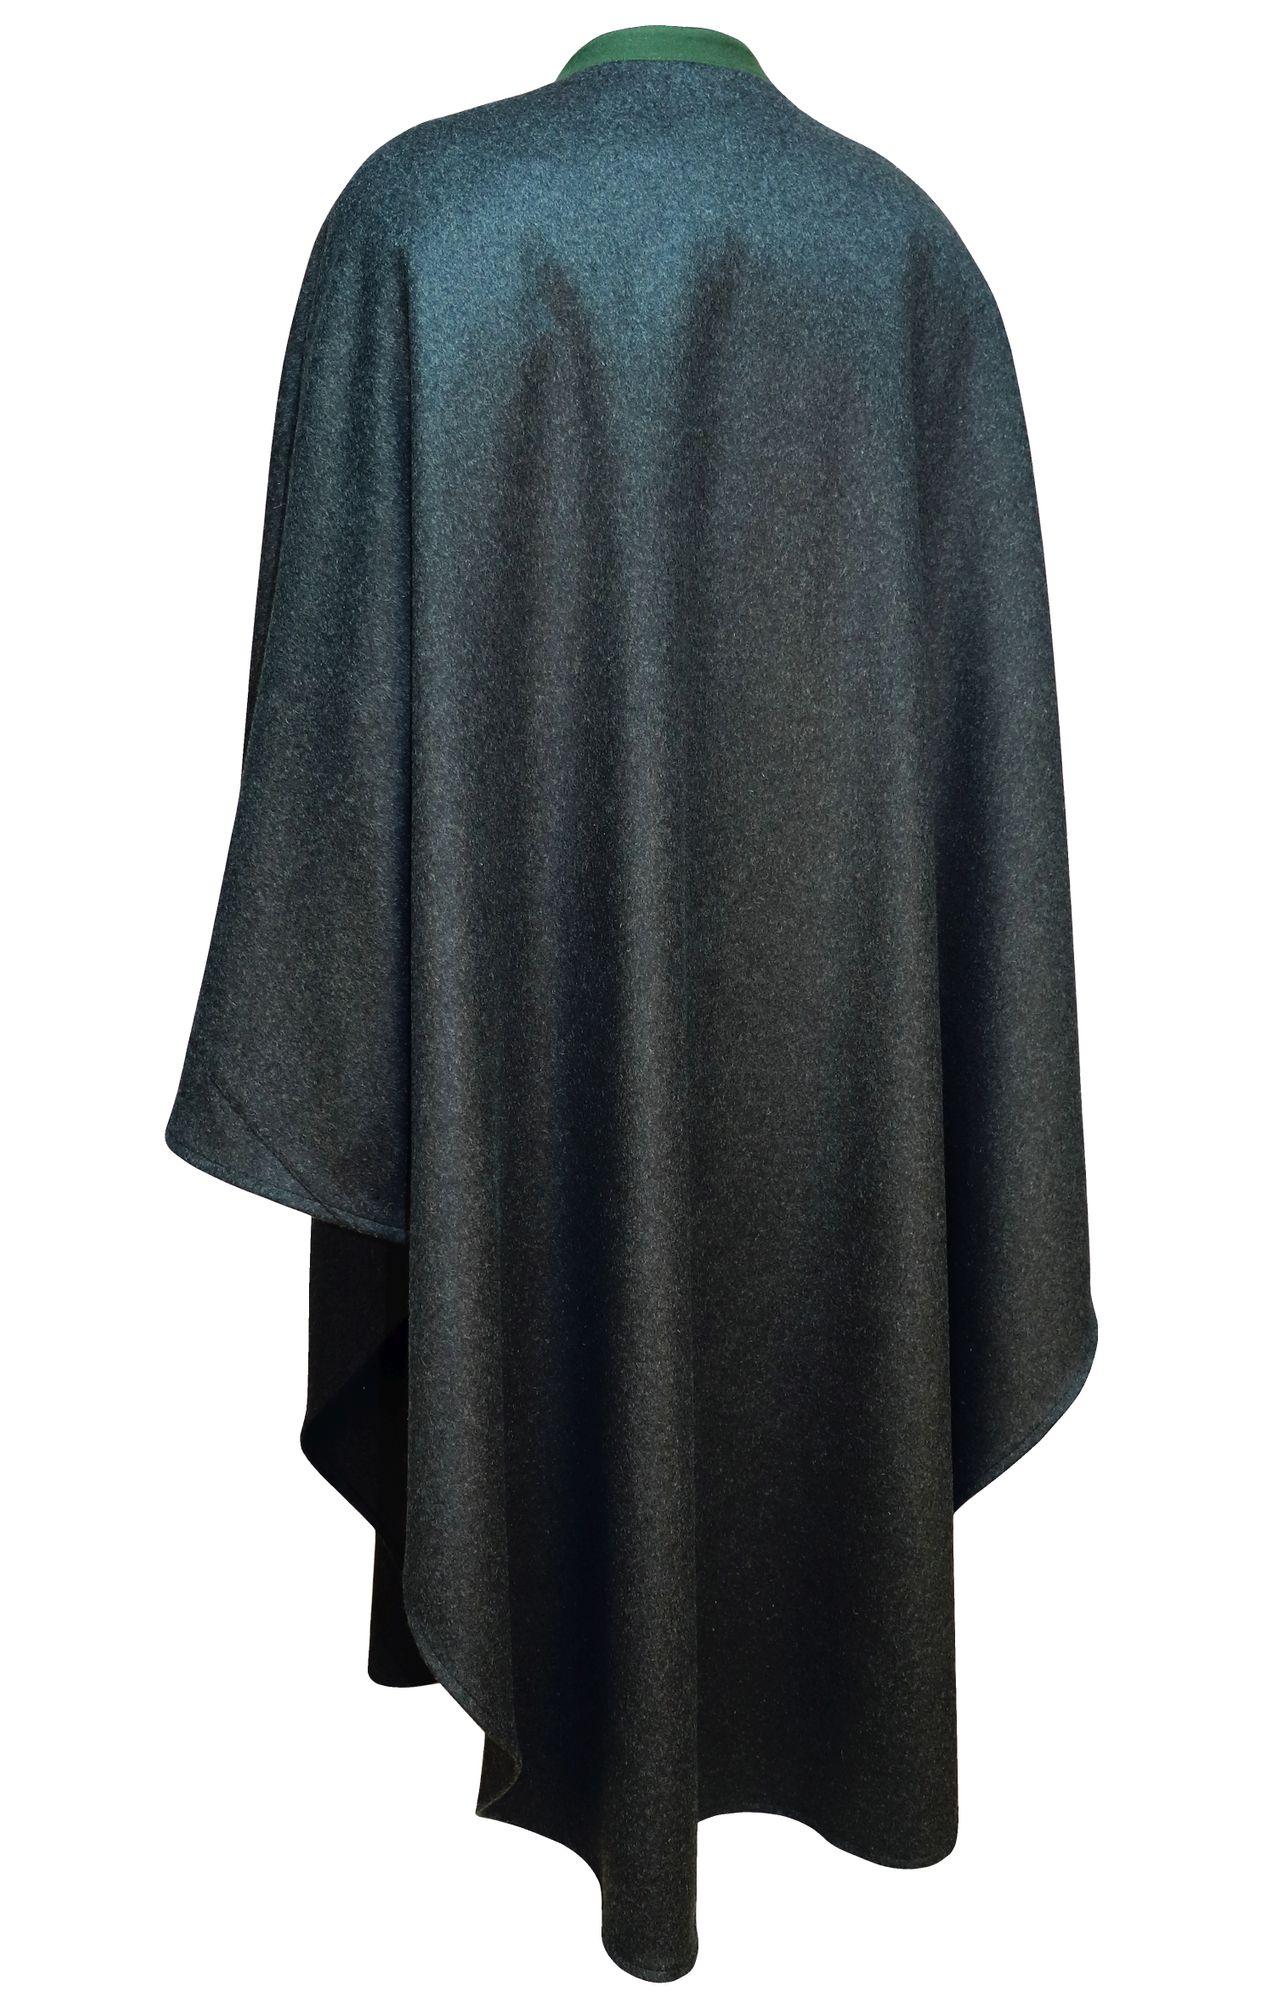 Los Angeles gute Qualität offizieller Preis Wetterfleck grau Loden Umhang Cape Poncho Trachtenmantel Pellerine  Damen-Mantel